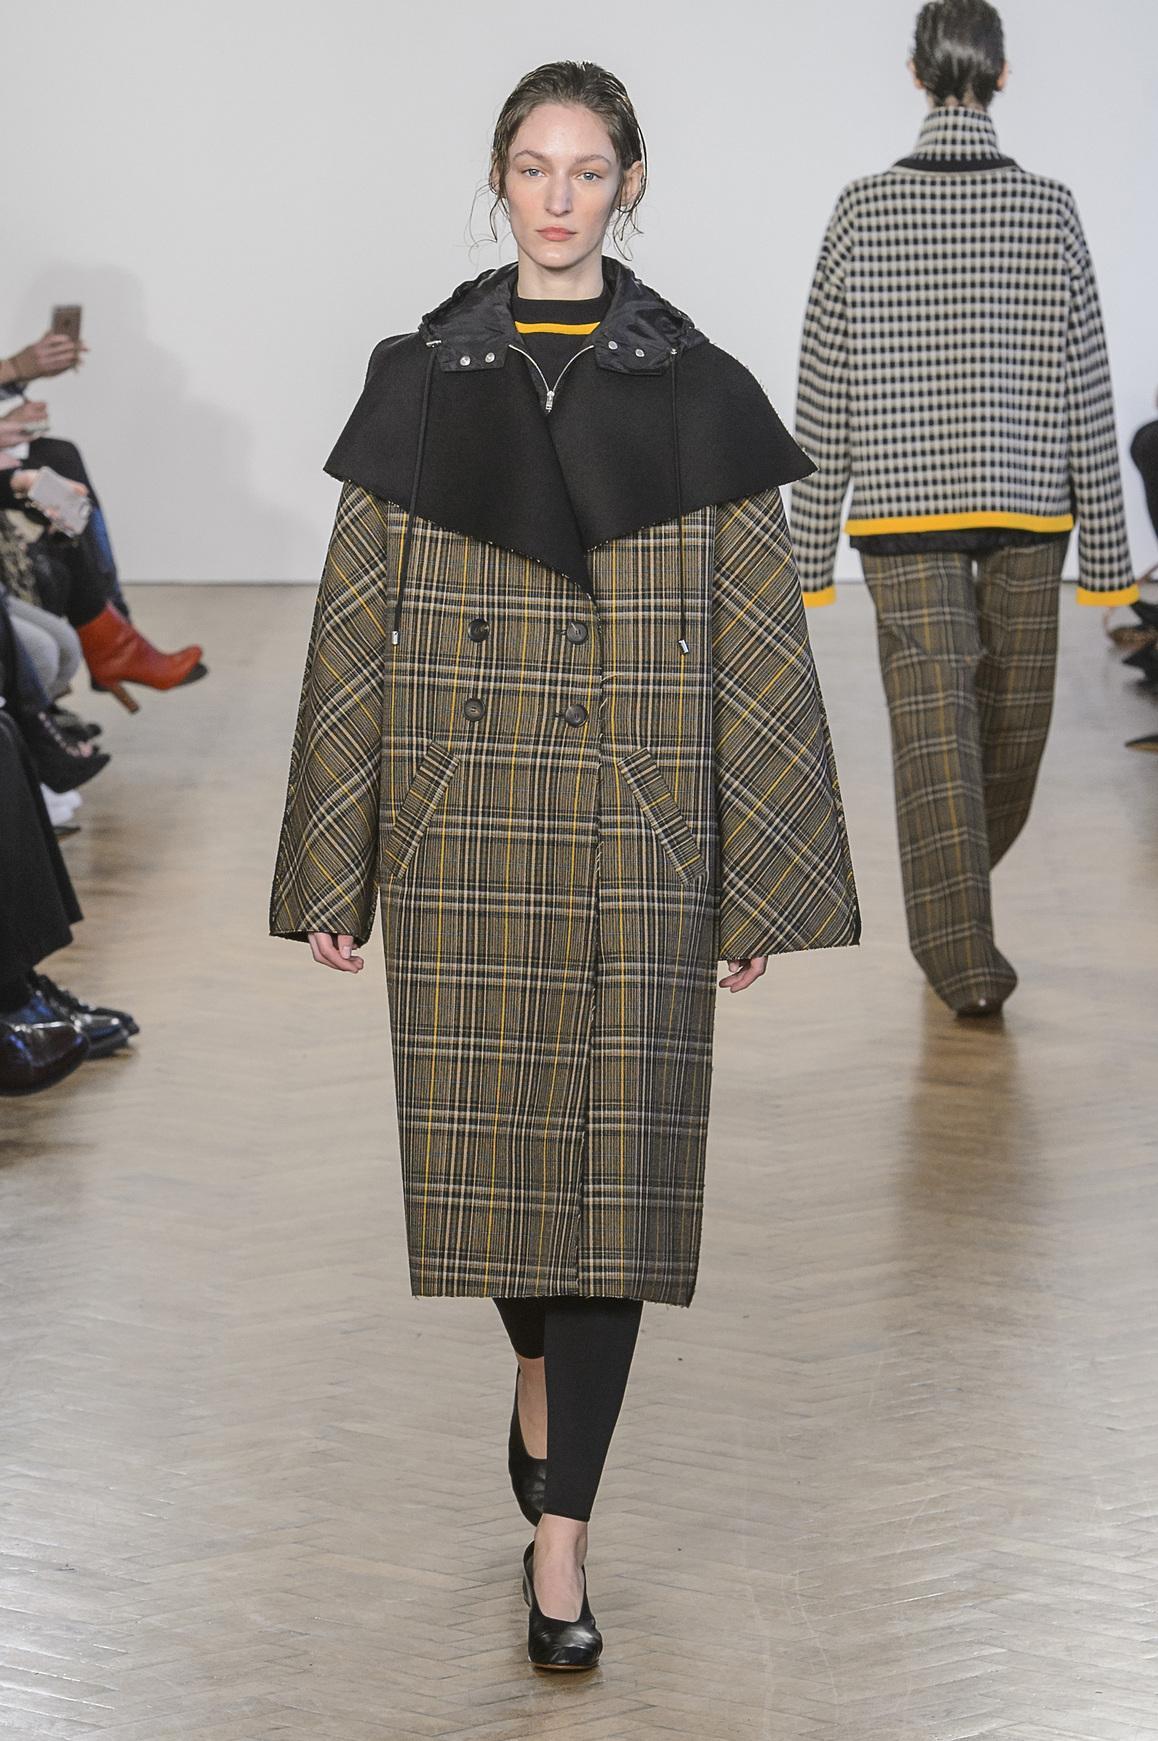 London Fashion Week - Pringle of Scotland 5